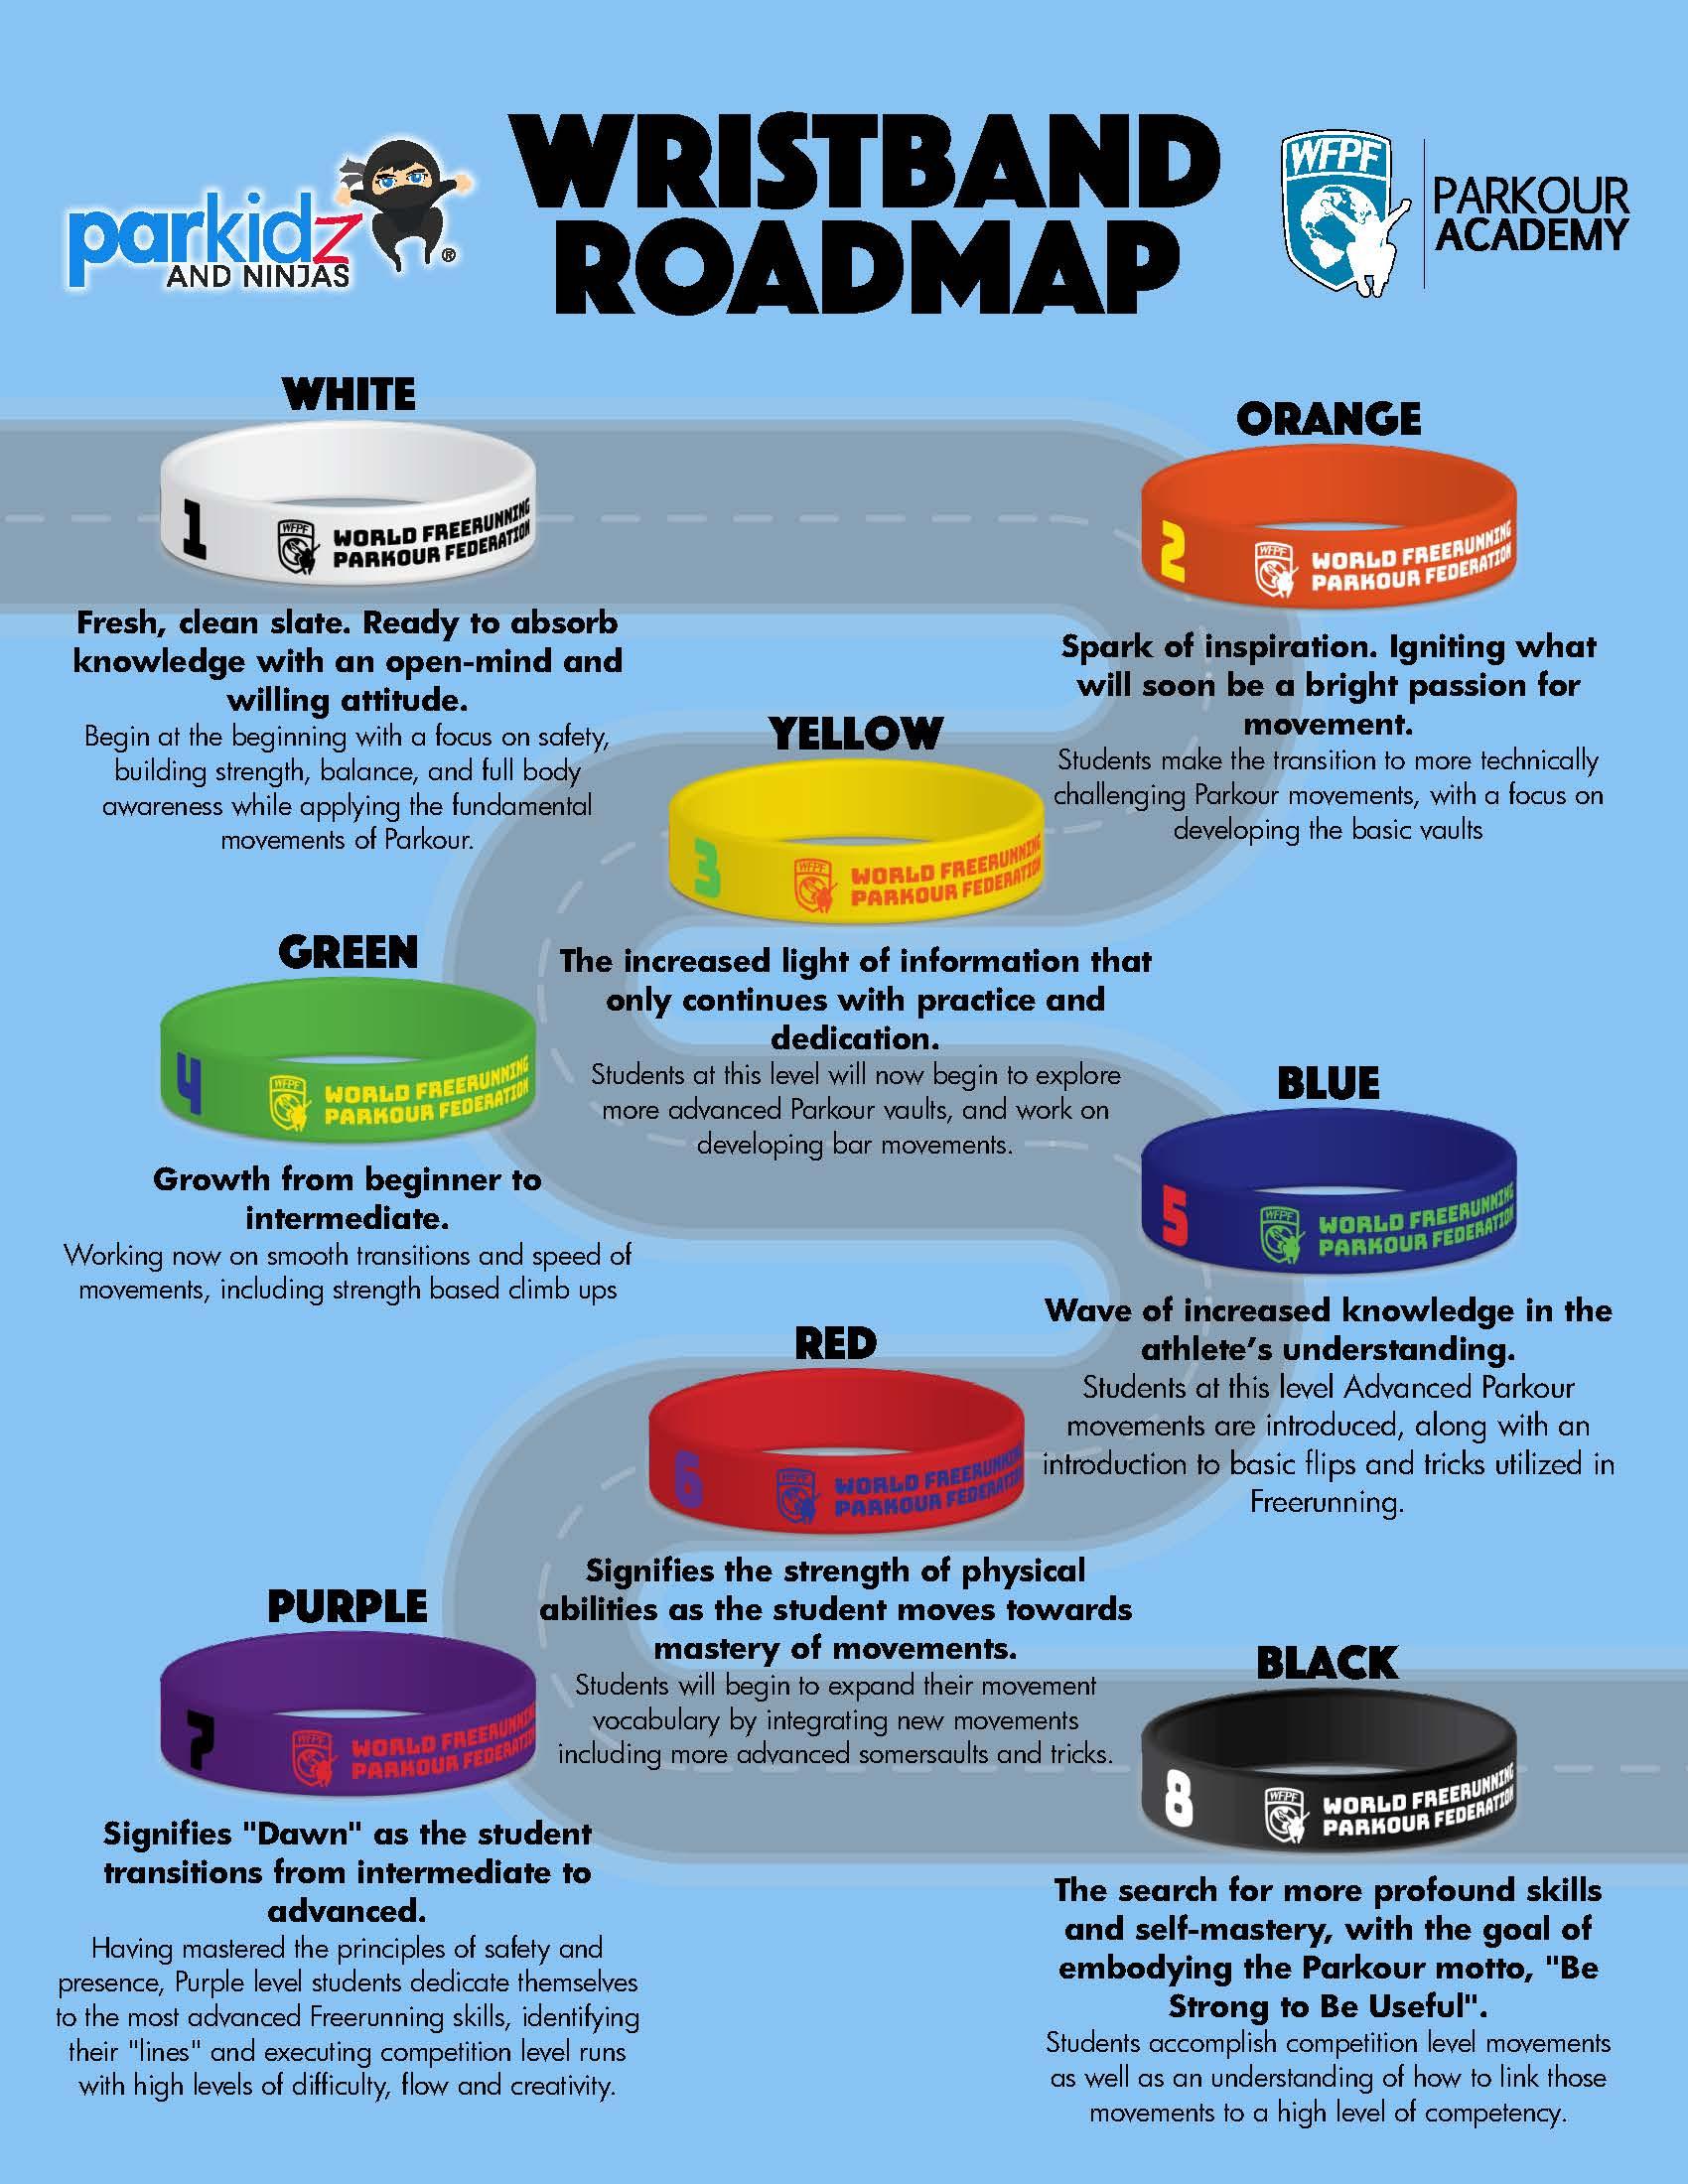 wfpf_wristband_roadmap.jpg